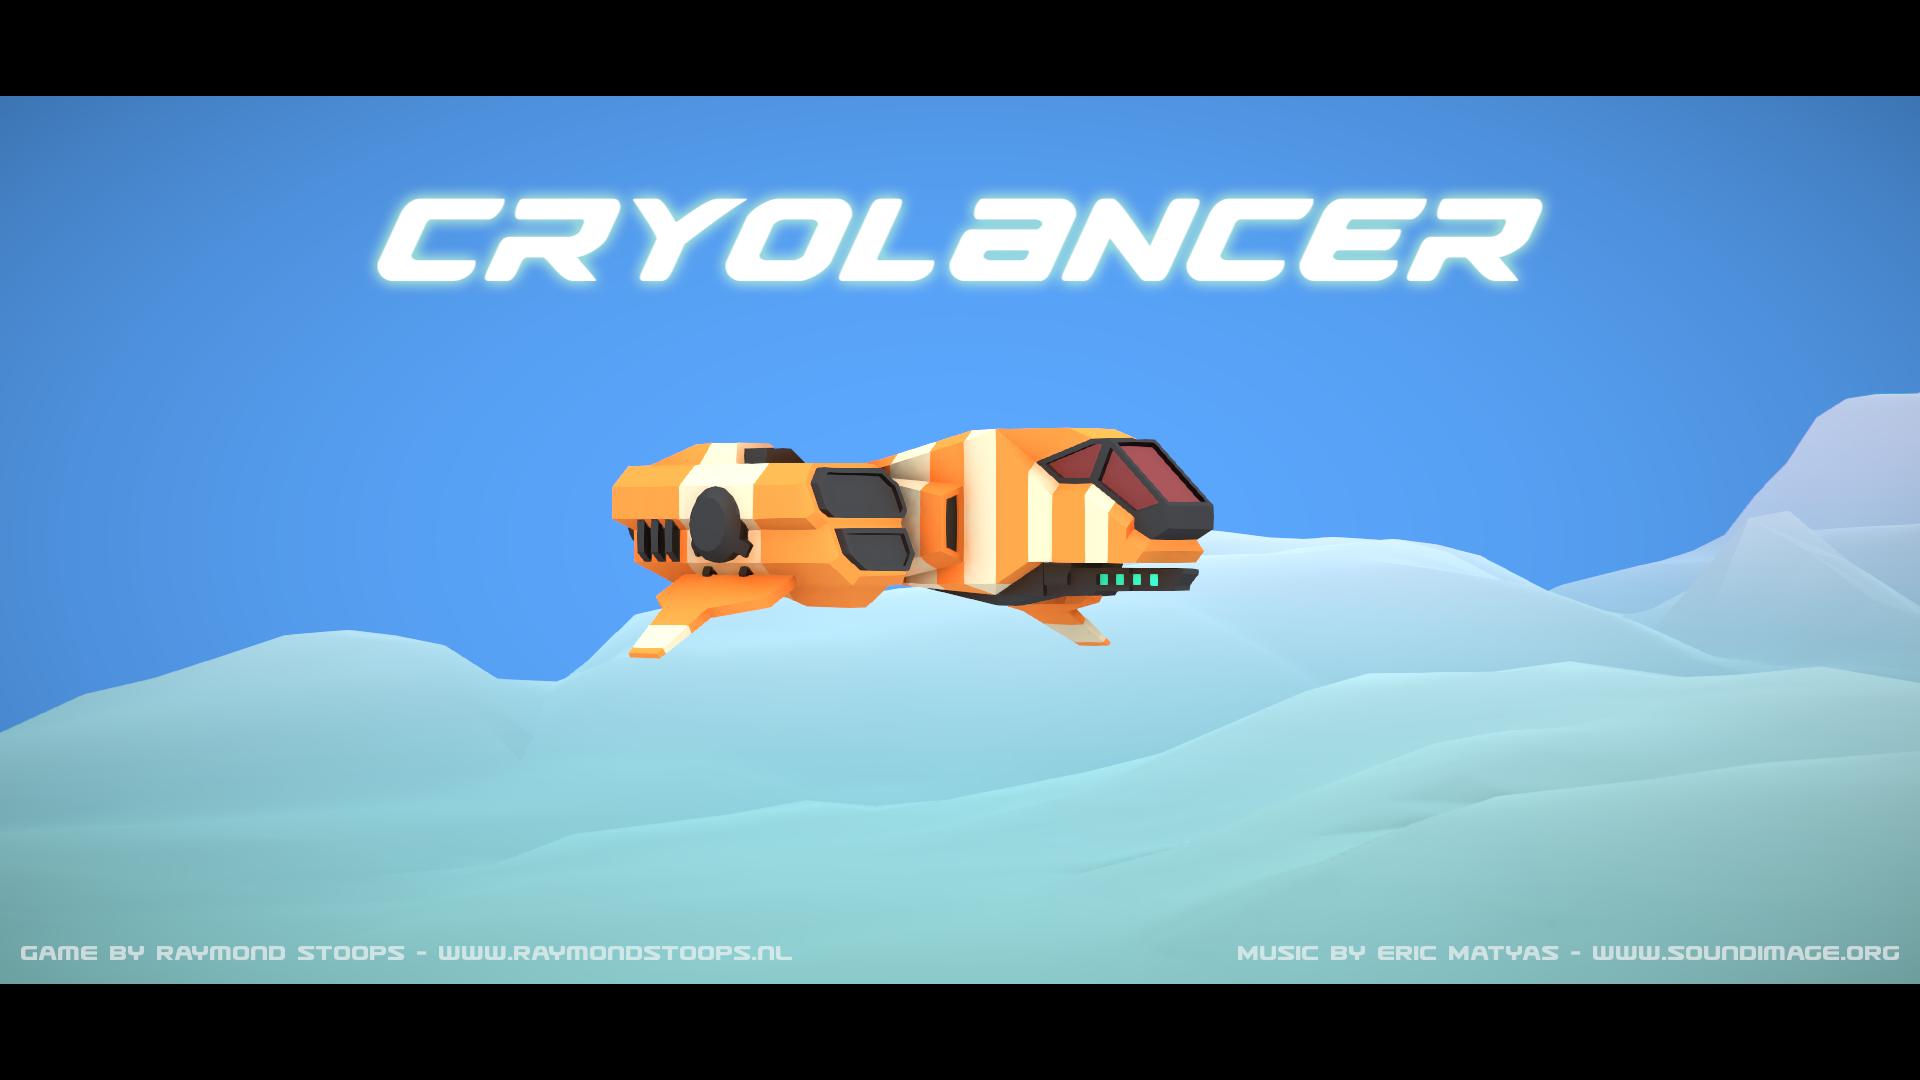 Cryolancer